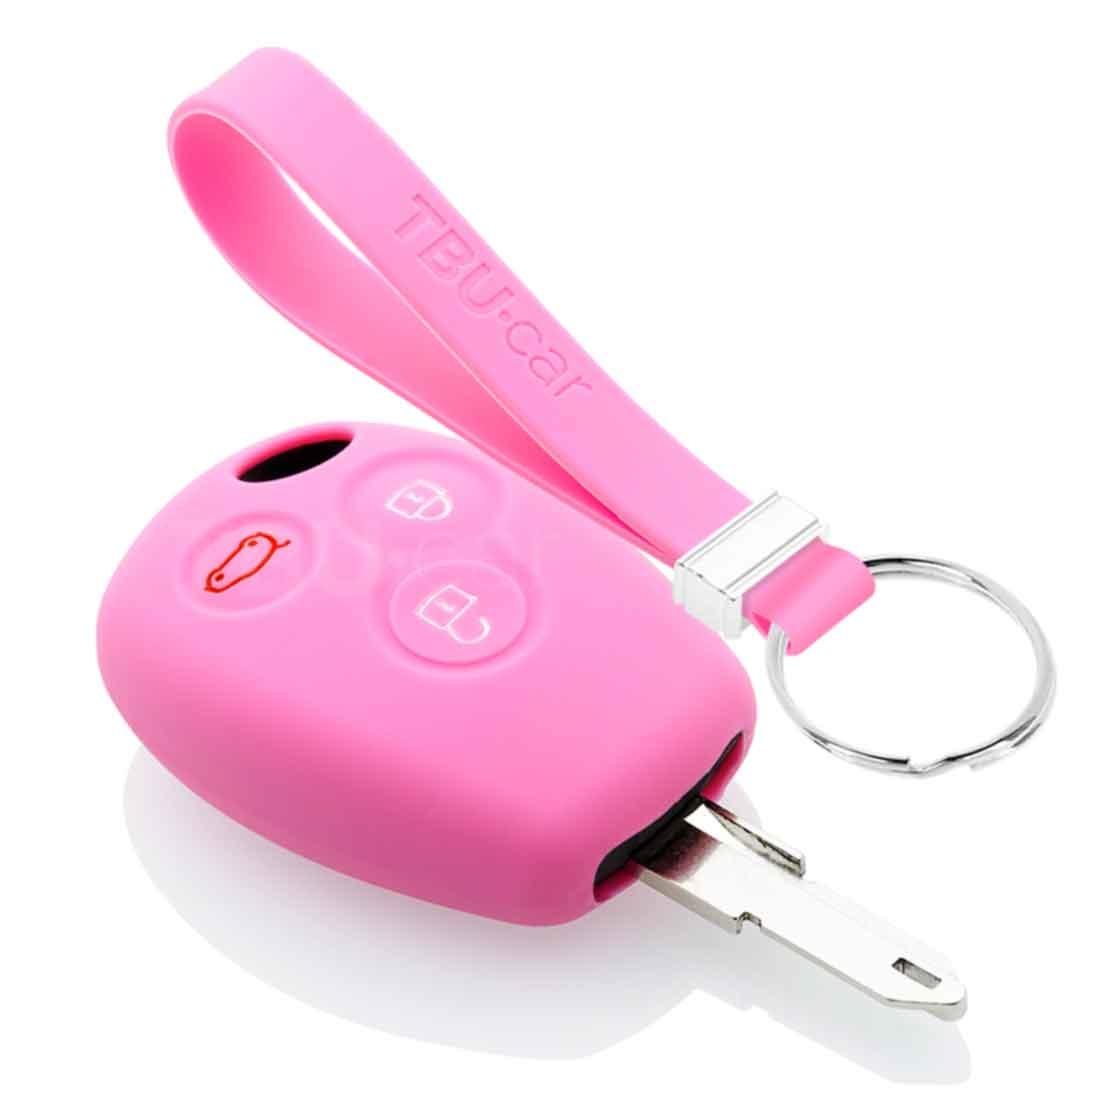 TBU car TBU car Sleutel cover compatibel met Dacia - Silicone sleutelhoesje - beschermhoesje autosleutel - Roze